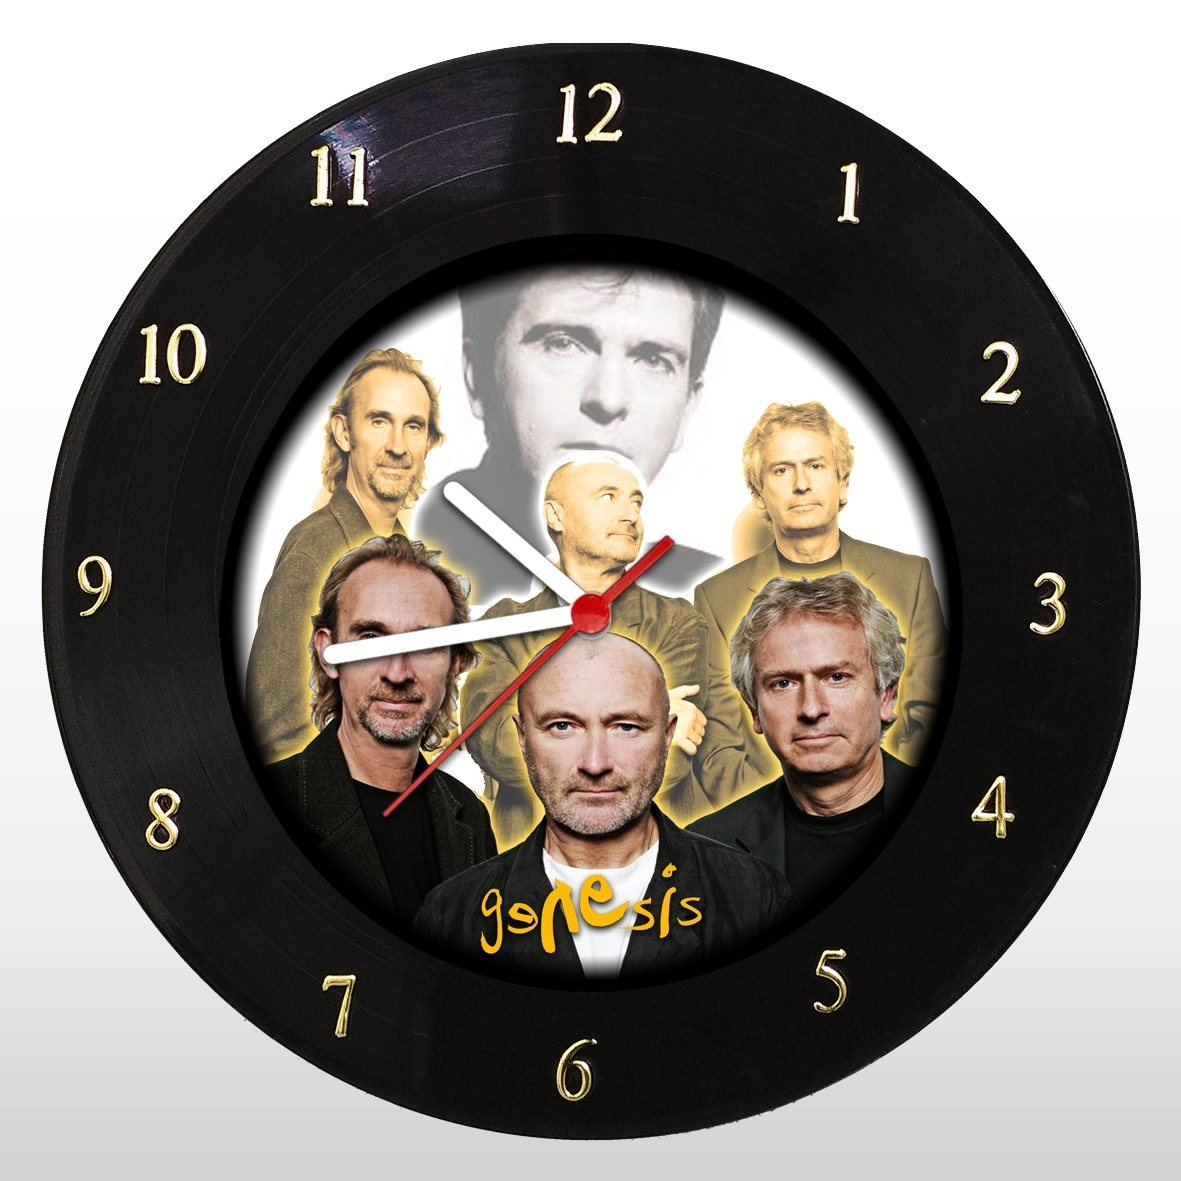 Genesis - Relógio de Parede em Disco de Vinil - Mr. Rock